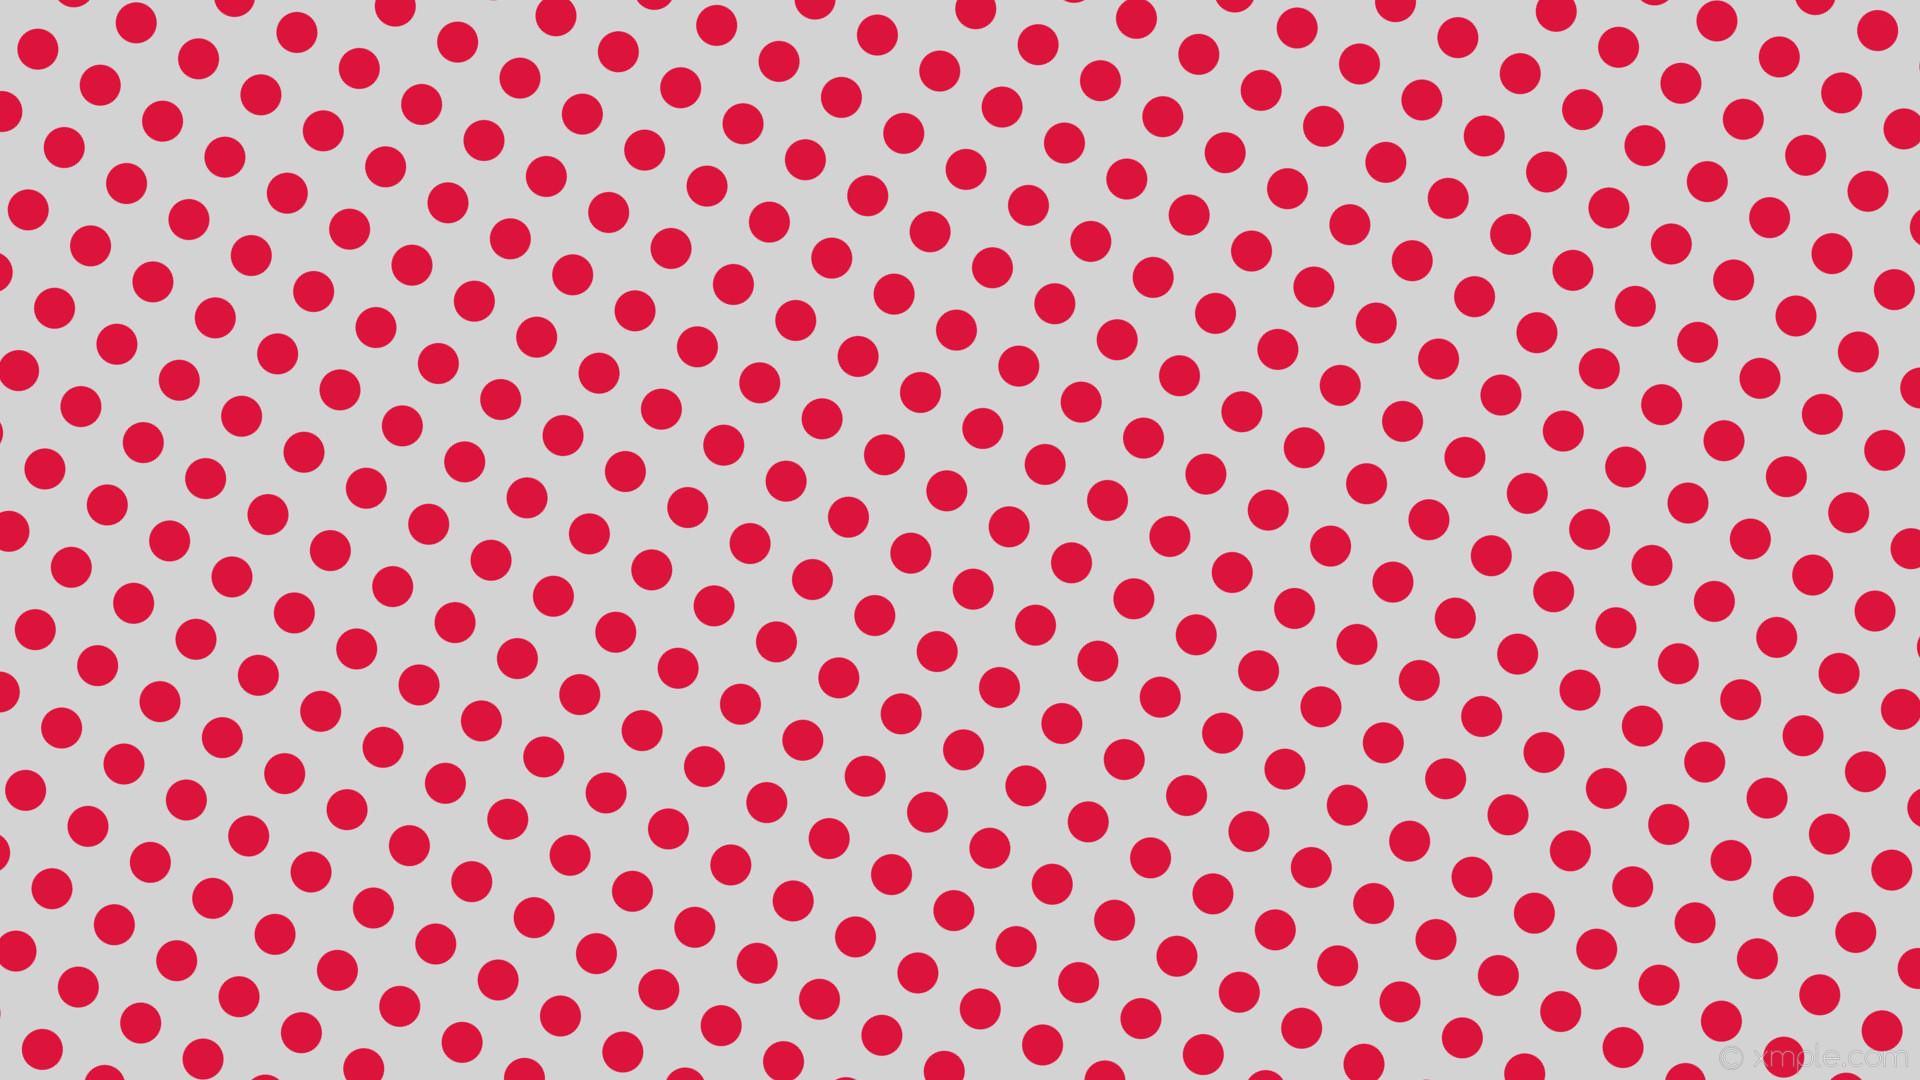 wallpaper grey spots red polka dots light gray crimson #d3d3d3 #dc143c 150°  41px